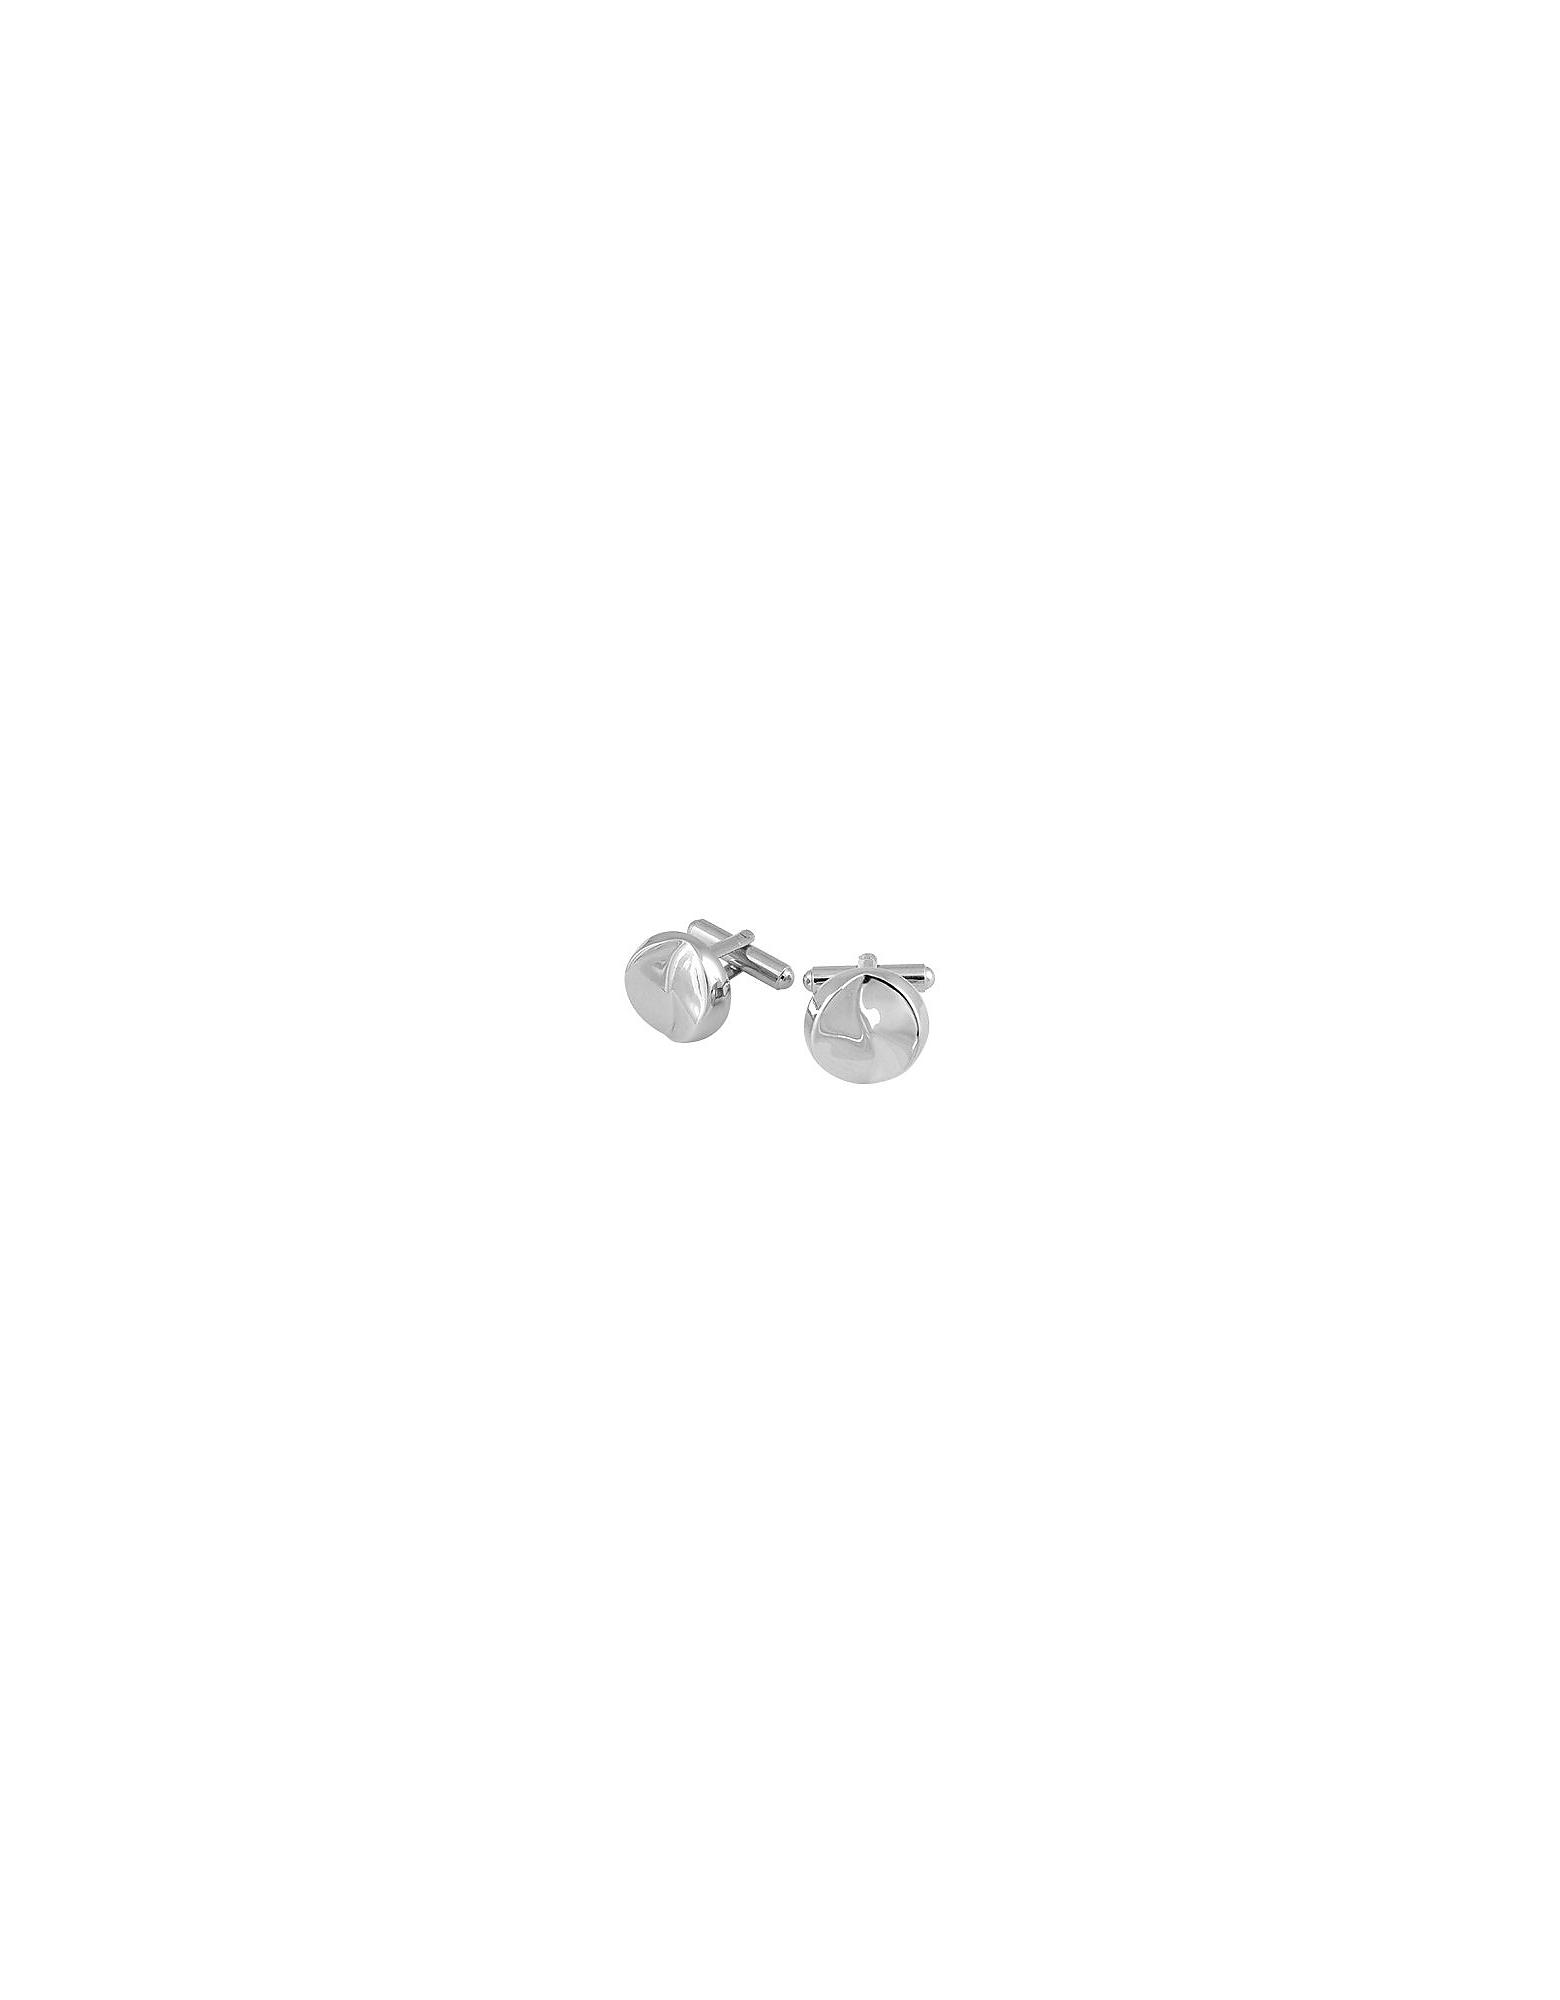 ATH collection - Gemelli forma tonda irregolare